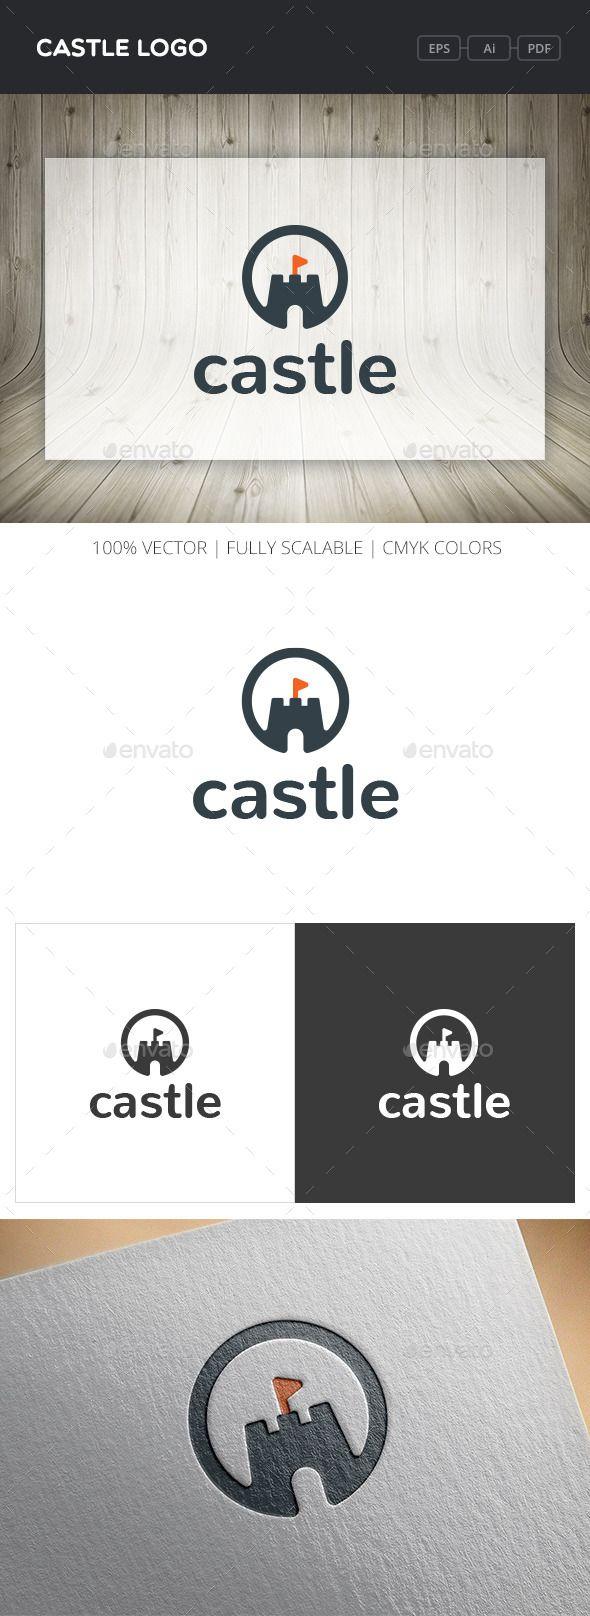 Castle Logo — Vector EPS #kingdom #flag • Available here → https://graphicriver.net/item/castle-logo/12108303?ref=pxcr